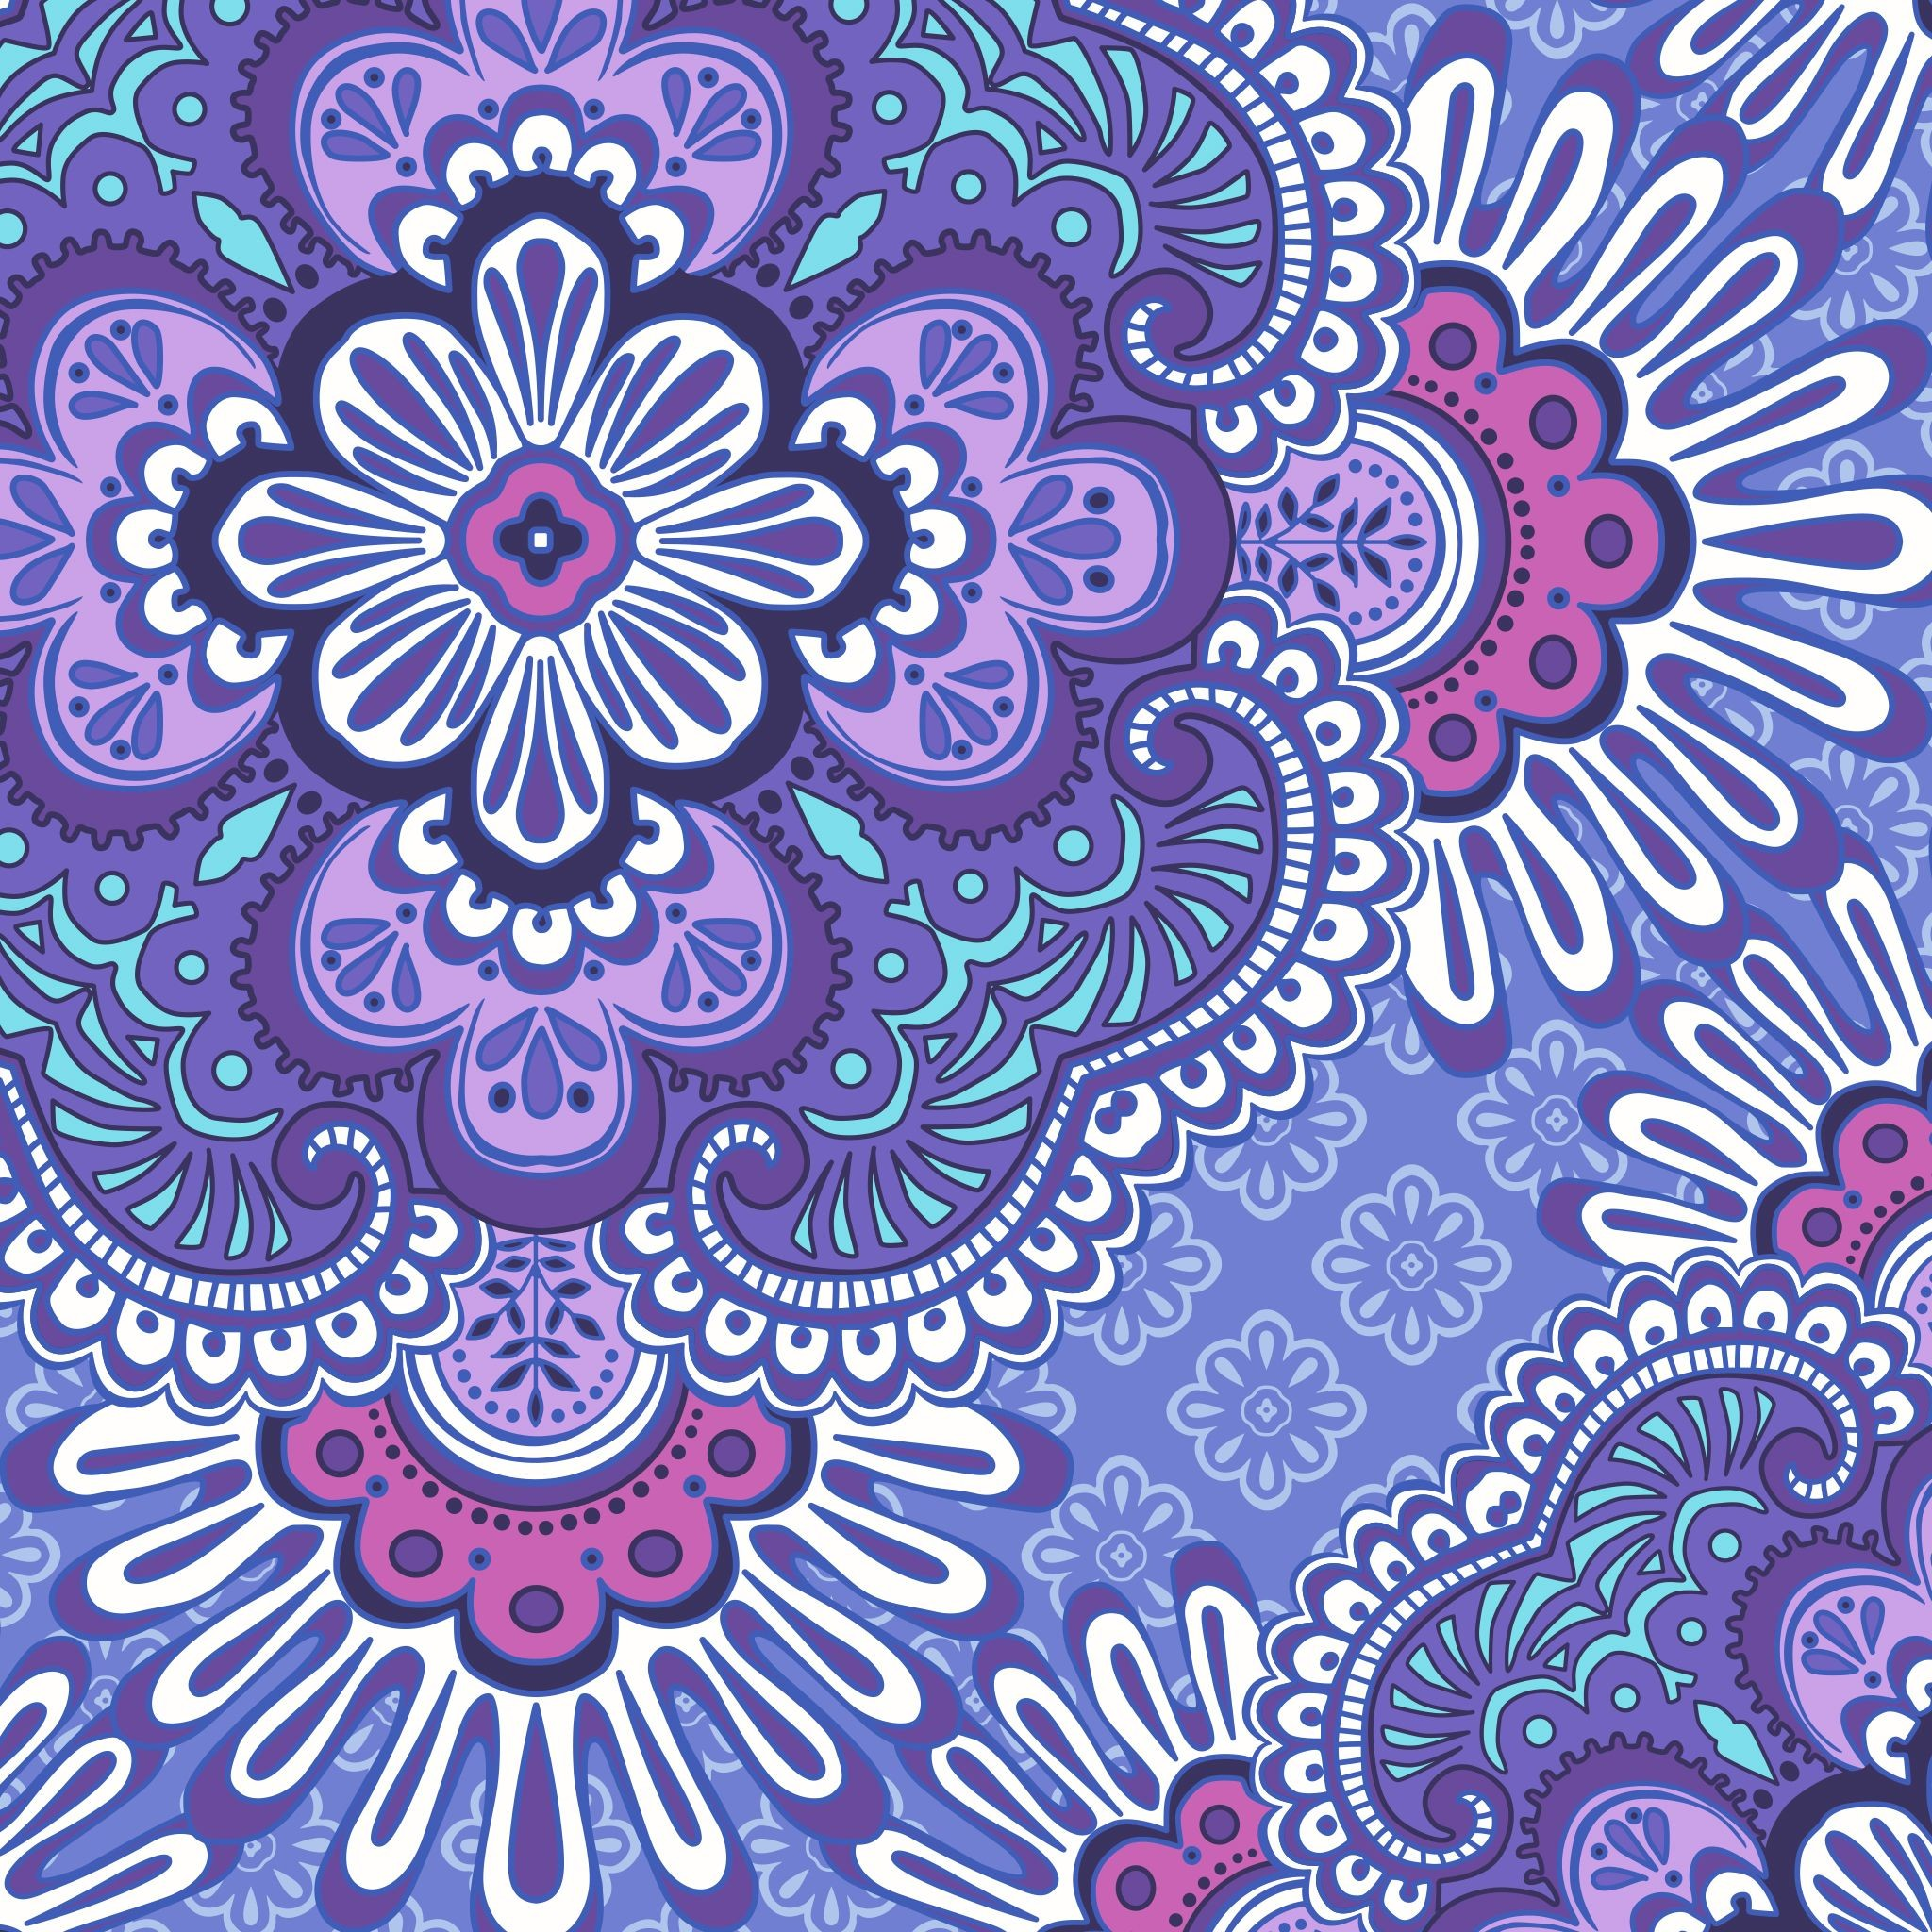 Tapestry Wallpaper Desktop 183 ① Wallpapertag